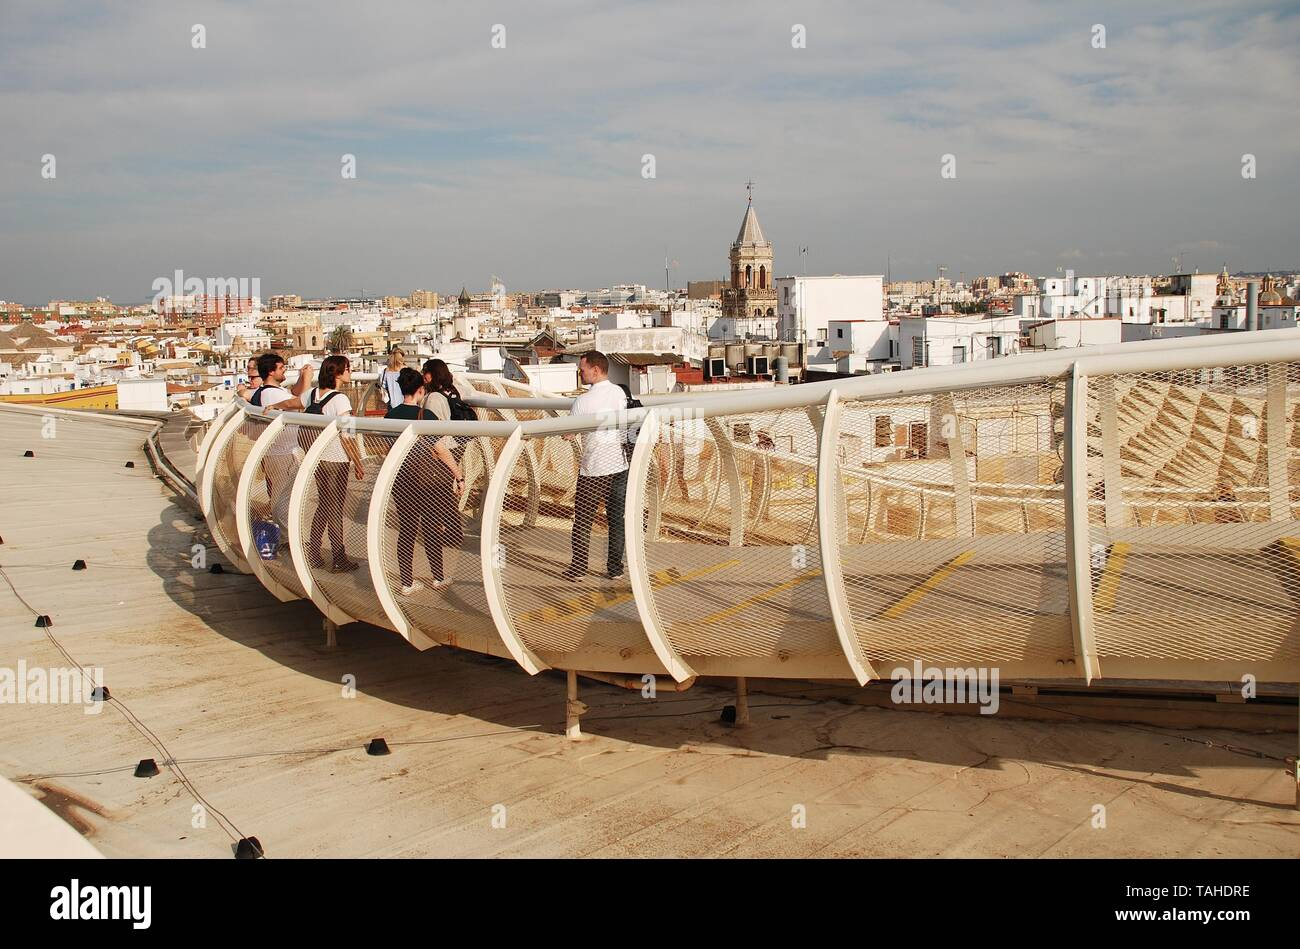 Las Setas De Sevilla Stock Photos & Las Setas De Sevilla